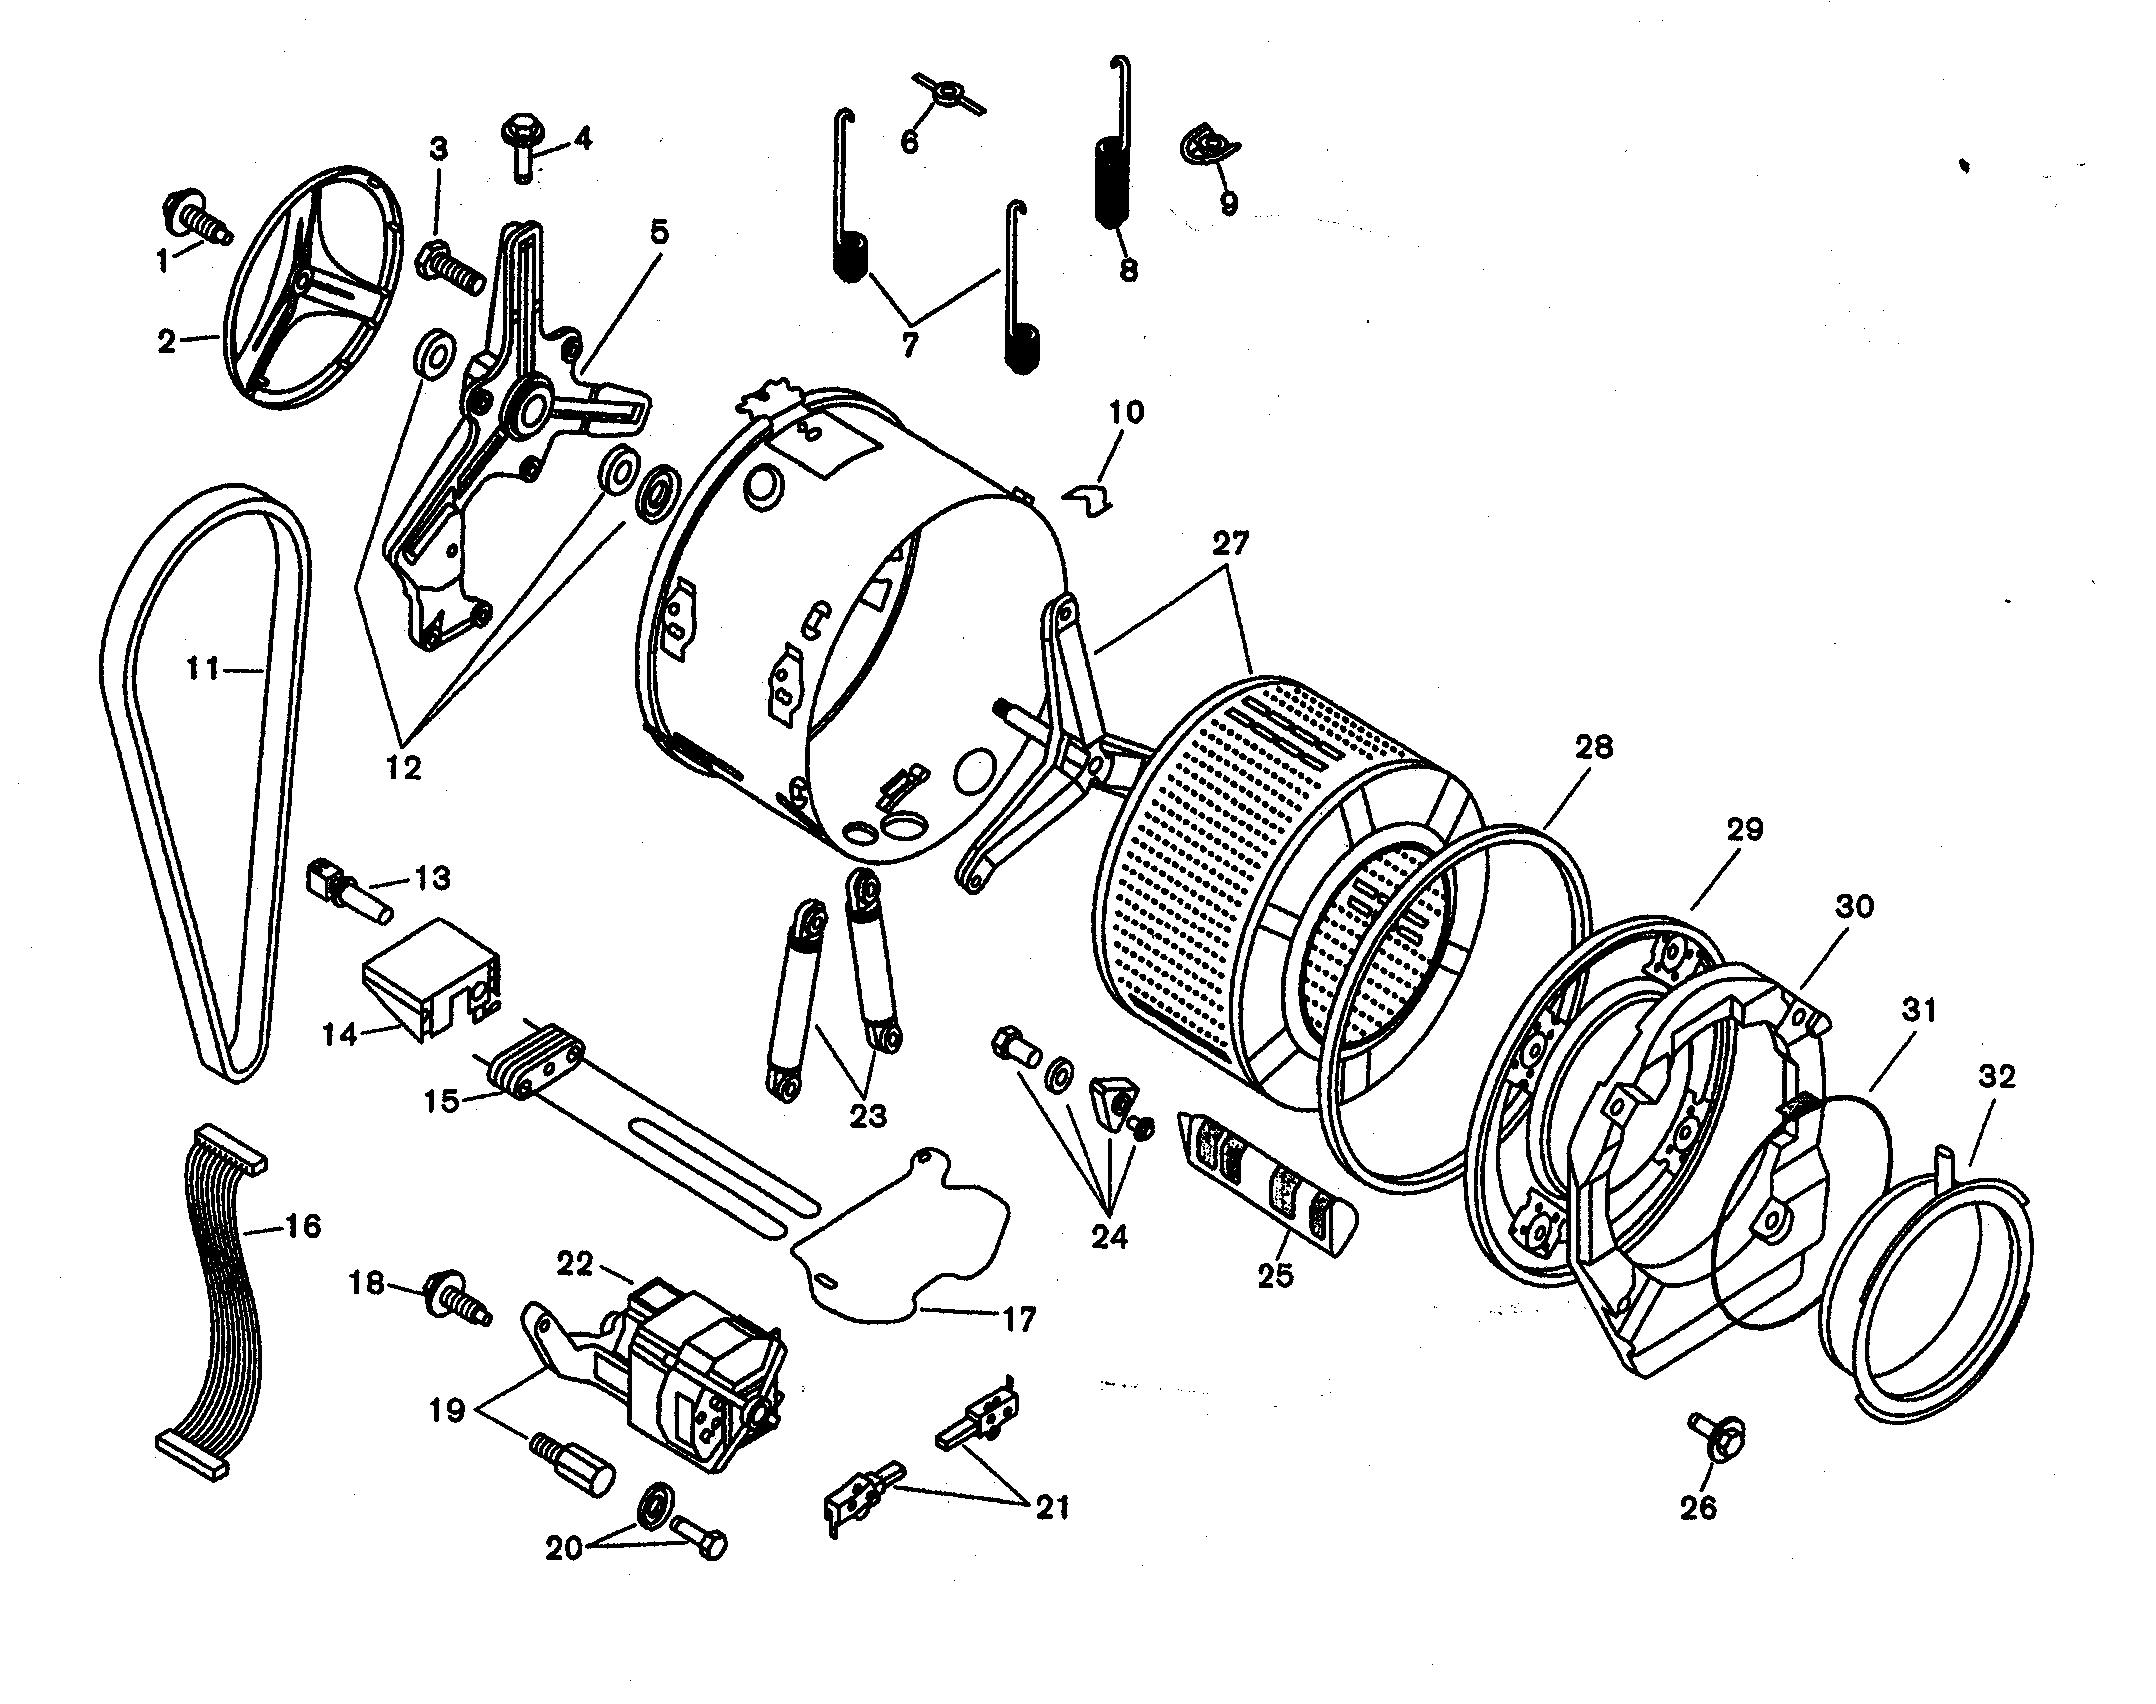 Washing Machines: Bosch Washing Machine Parts